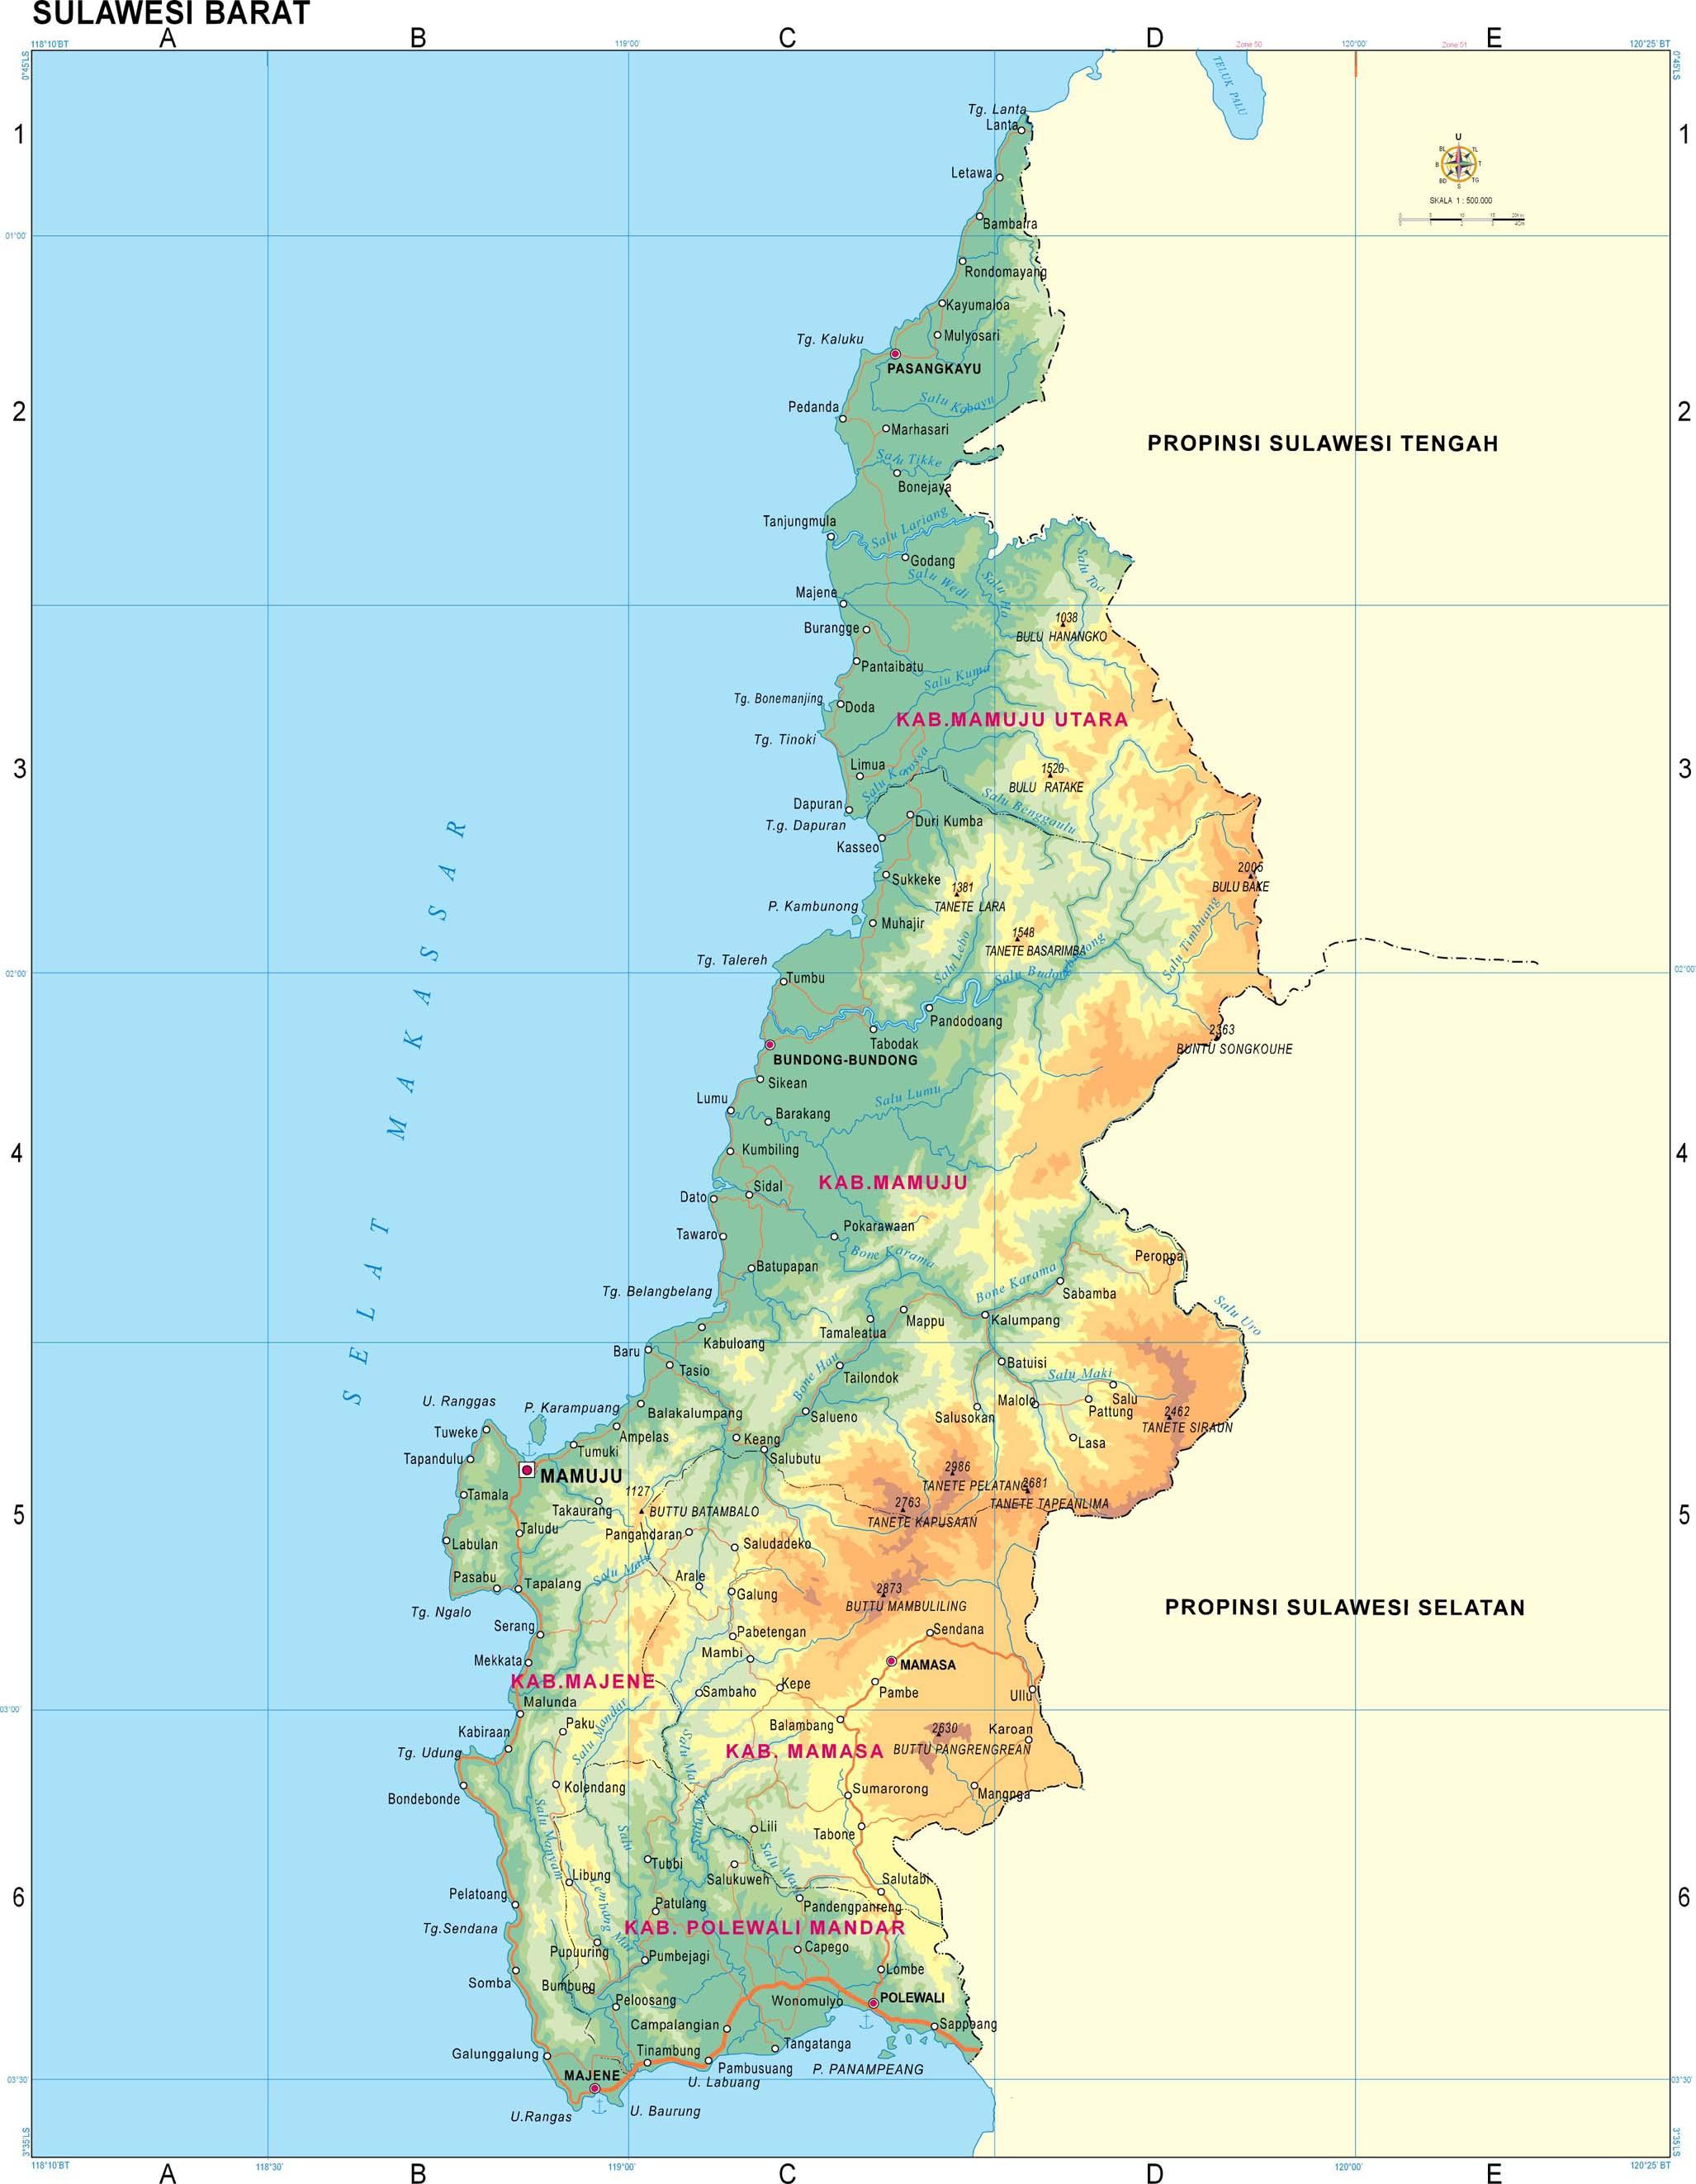 Informasi Cpns Ntt Berita Cpns 2016 Webcpns 2054 X 2645 Jpeg 339kb Tentang Propinsi Sulawesi Tengah Review